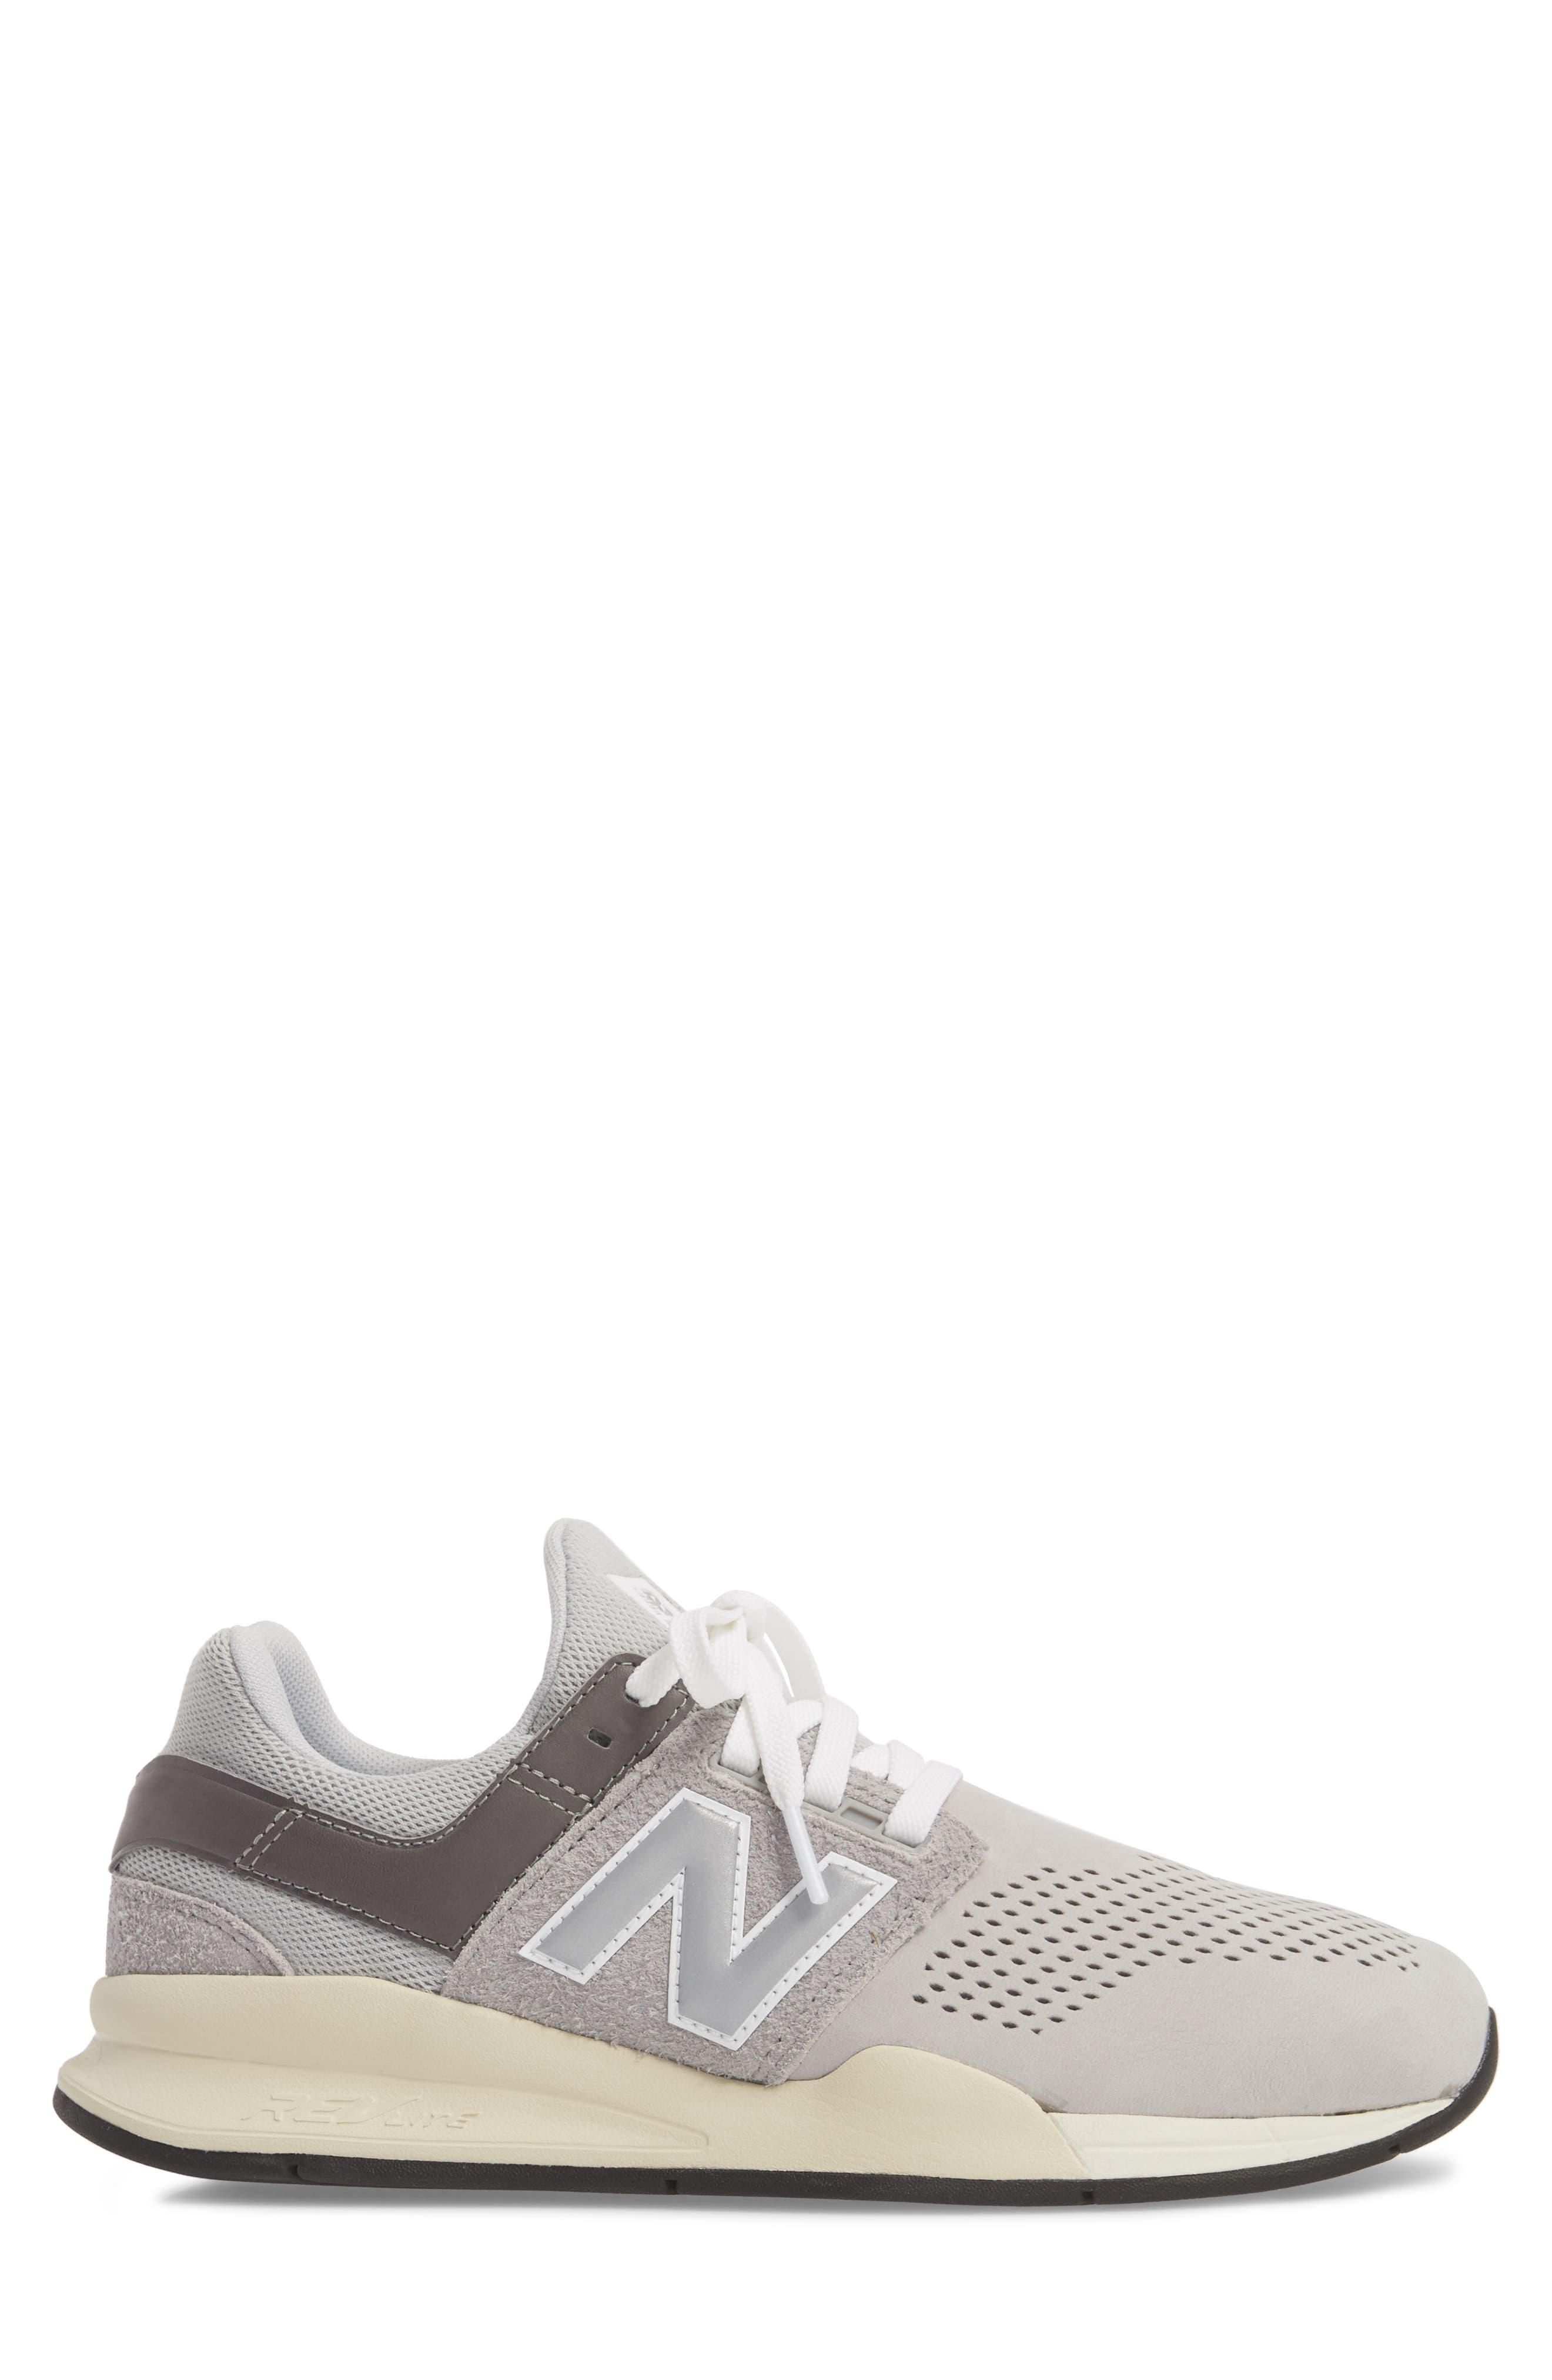 247 v2 Sneaker,                             Alternate thumbnail 6, color,                             Rain Cloud Leather